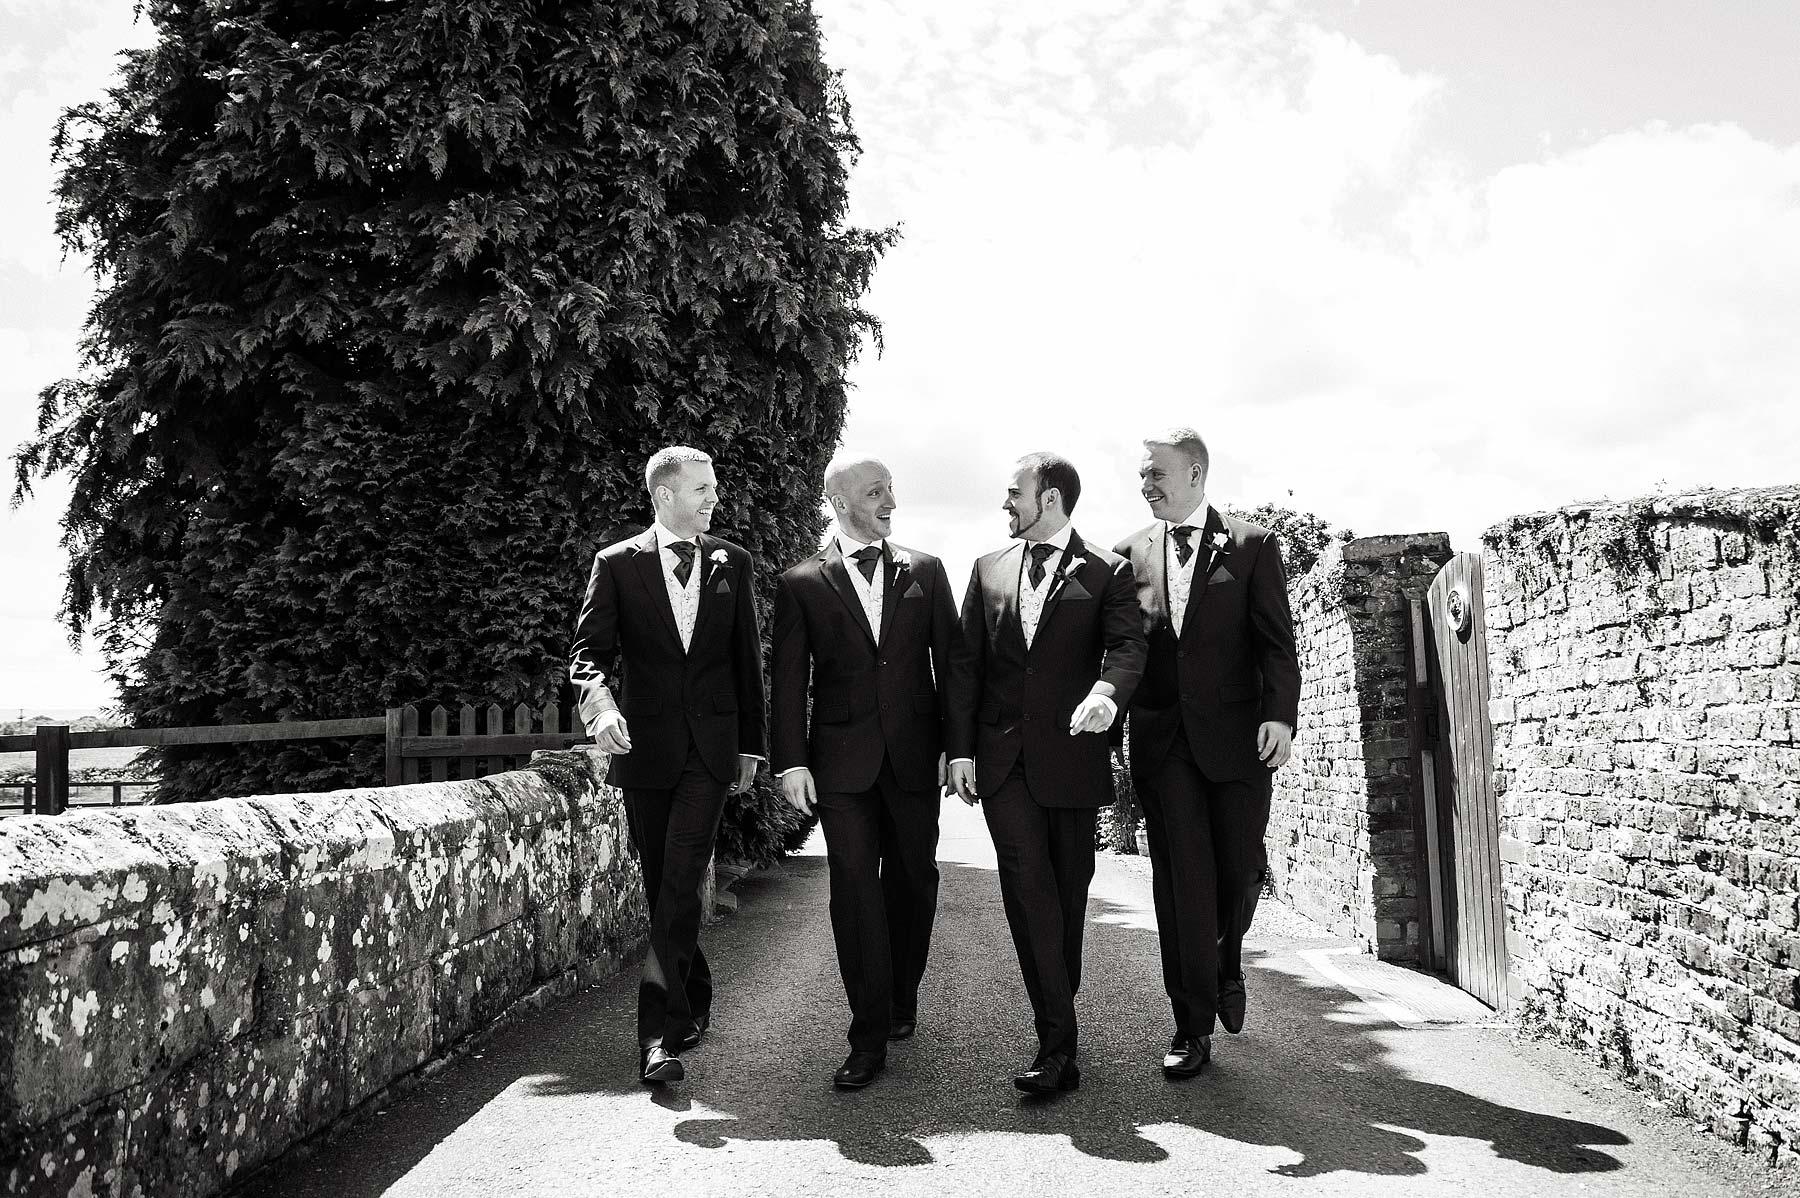 albright-hussey-manor-wedding-photographers-011